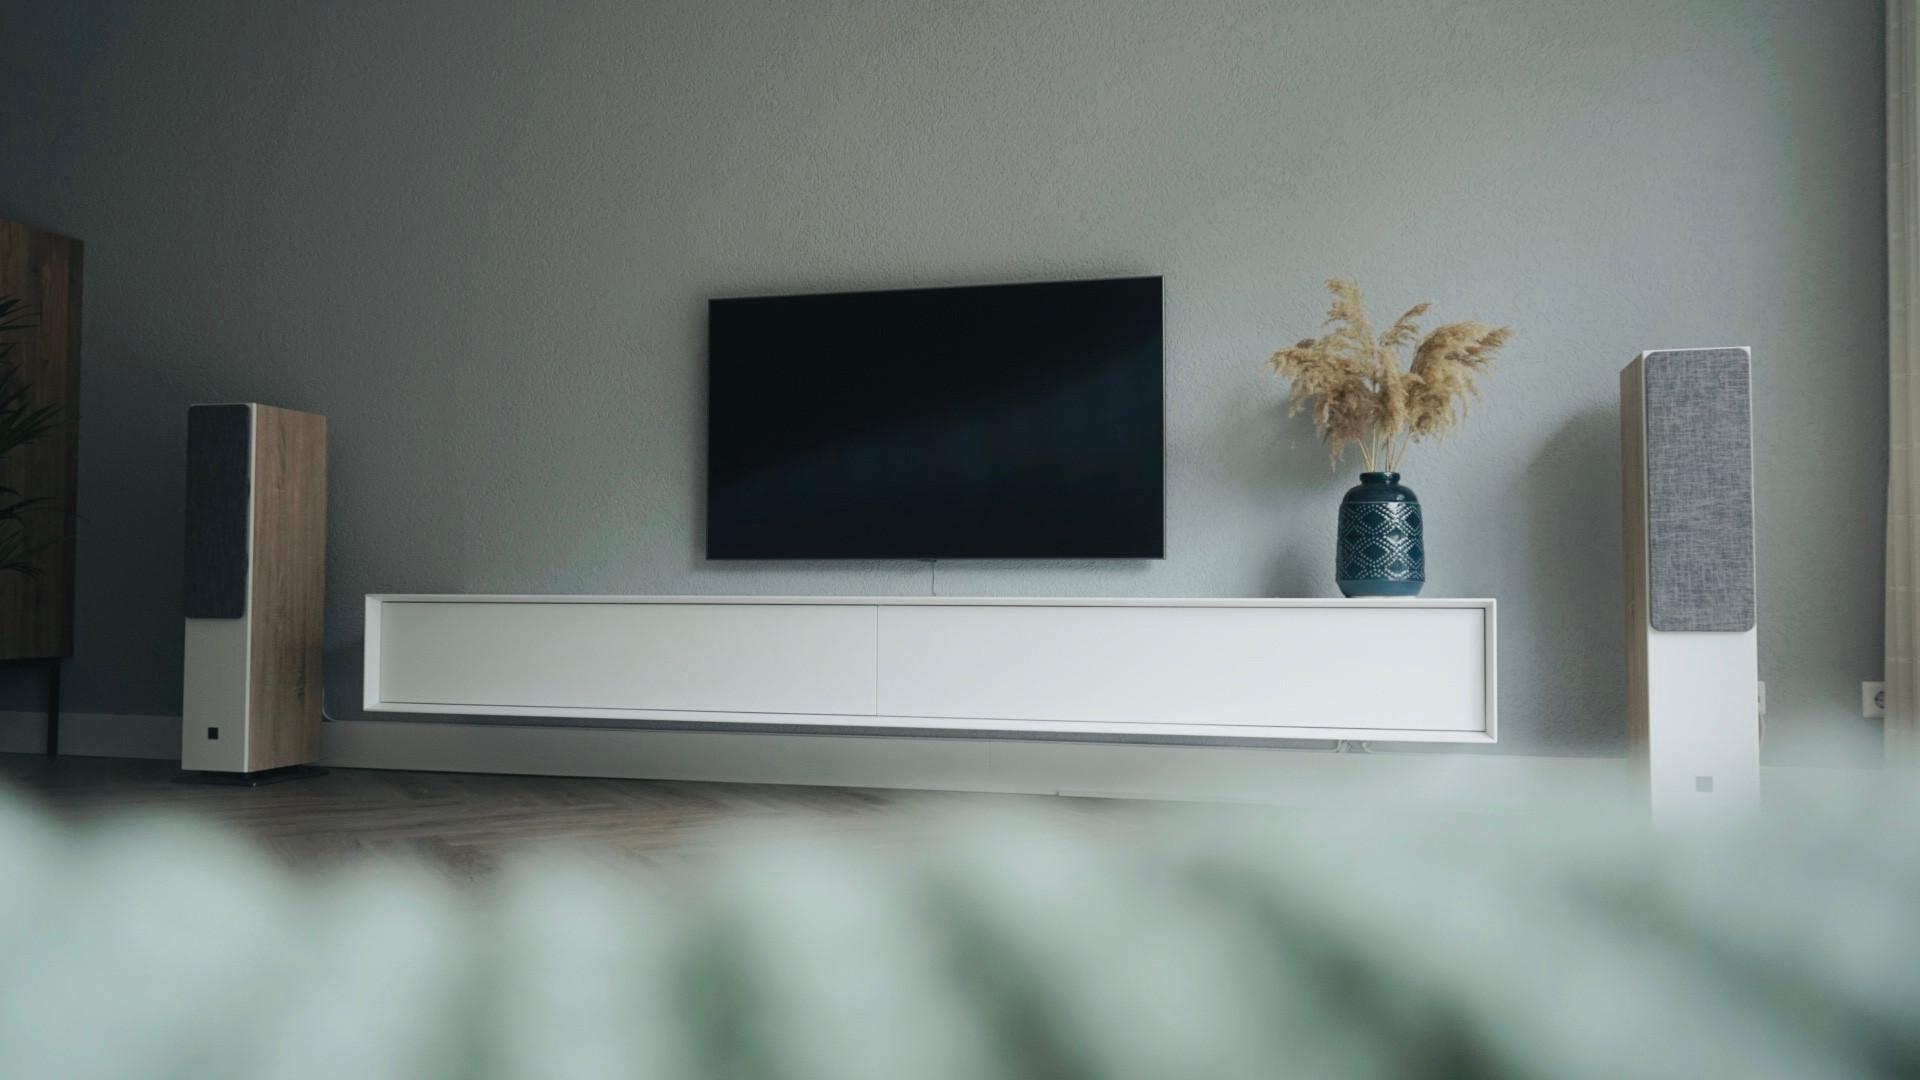 Design Meubel Op Maat - TV-meubel